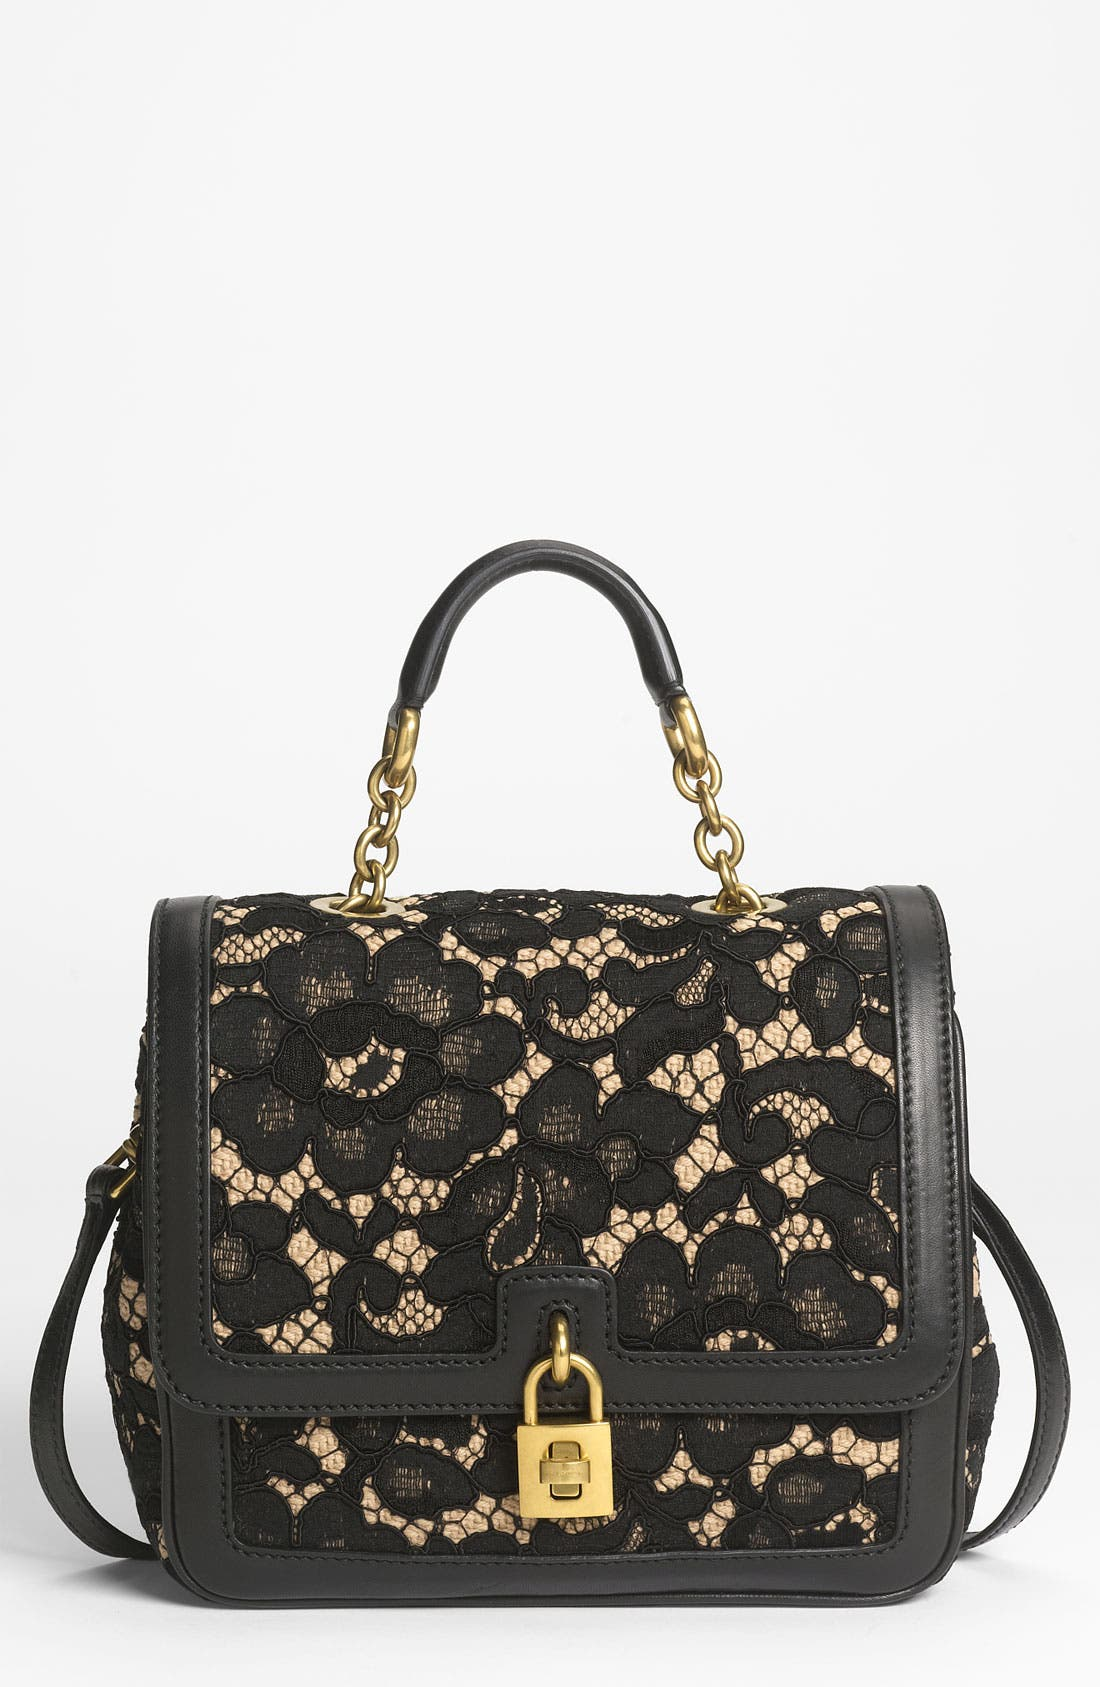 Alternate Image 1 Selected - Dolce&Gabbana 'Miss Dolce' Satchel